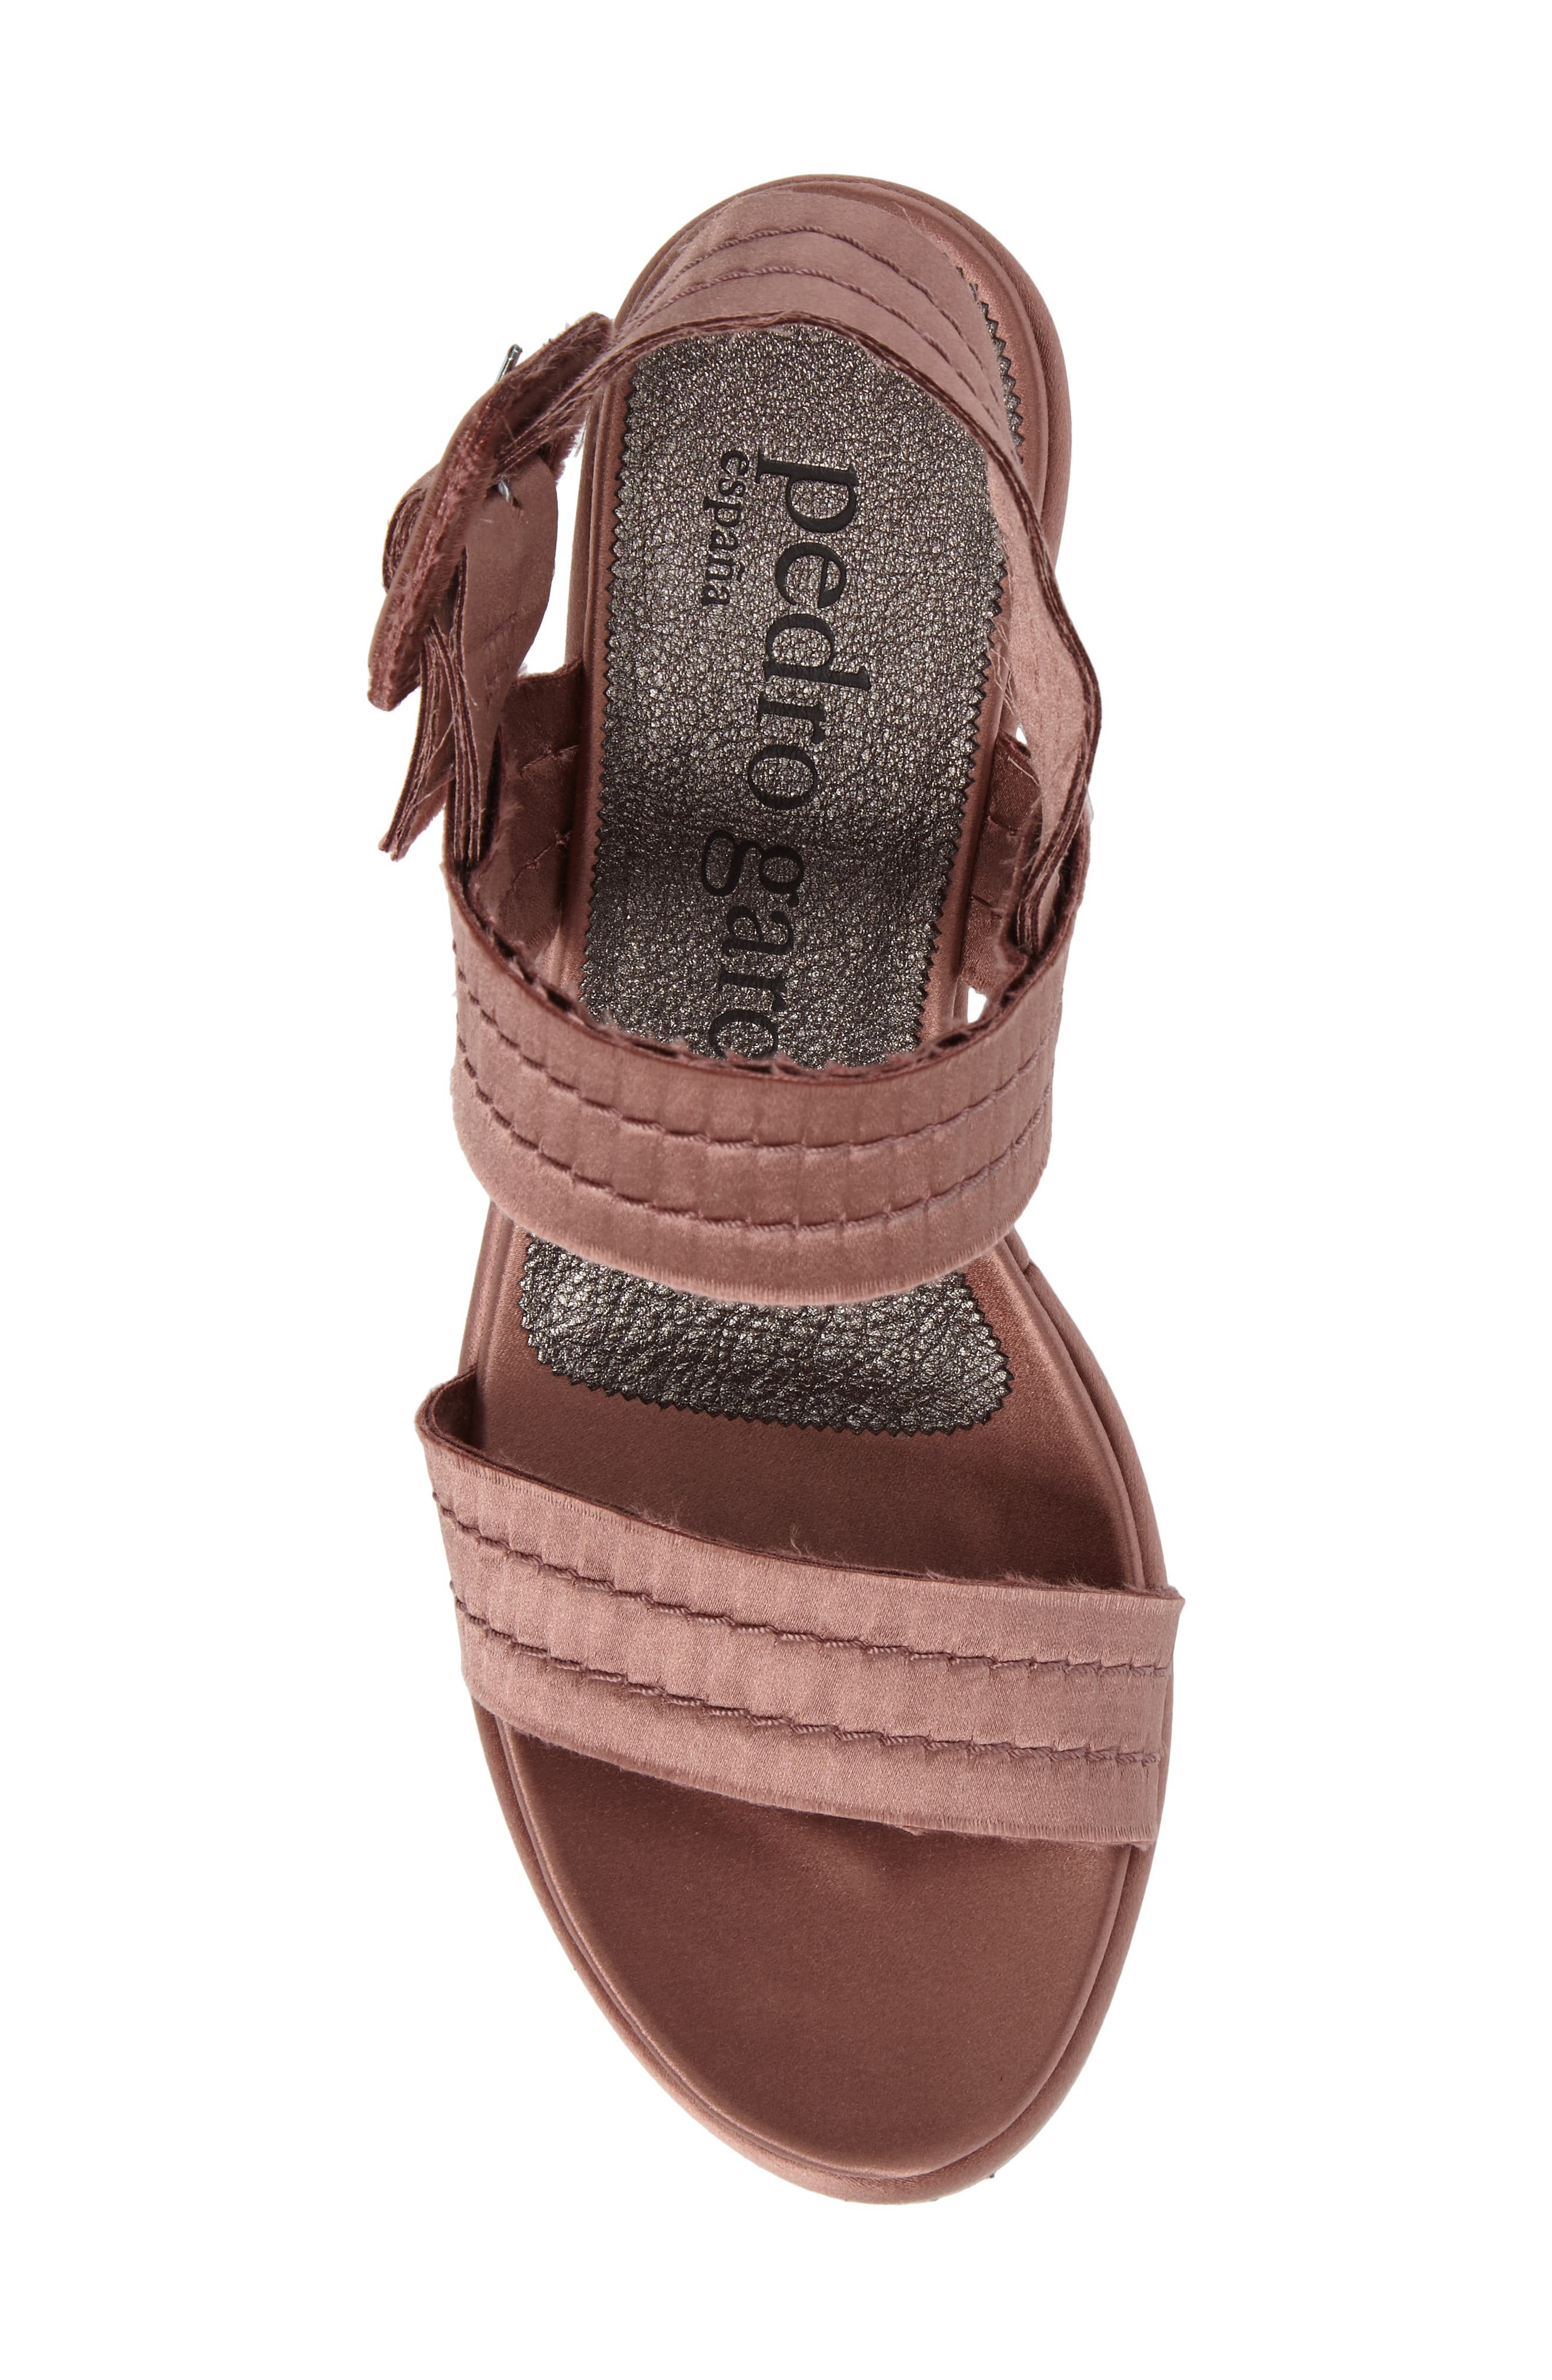 Decima Platform Sandal,                             Alternate thumbnail 5, color,                             Powder Satin